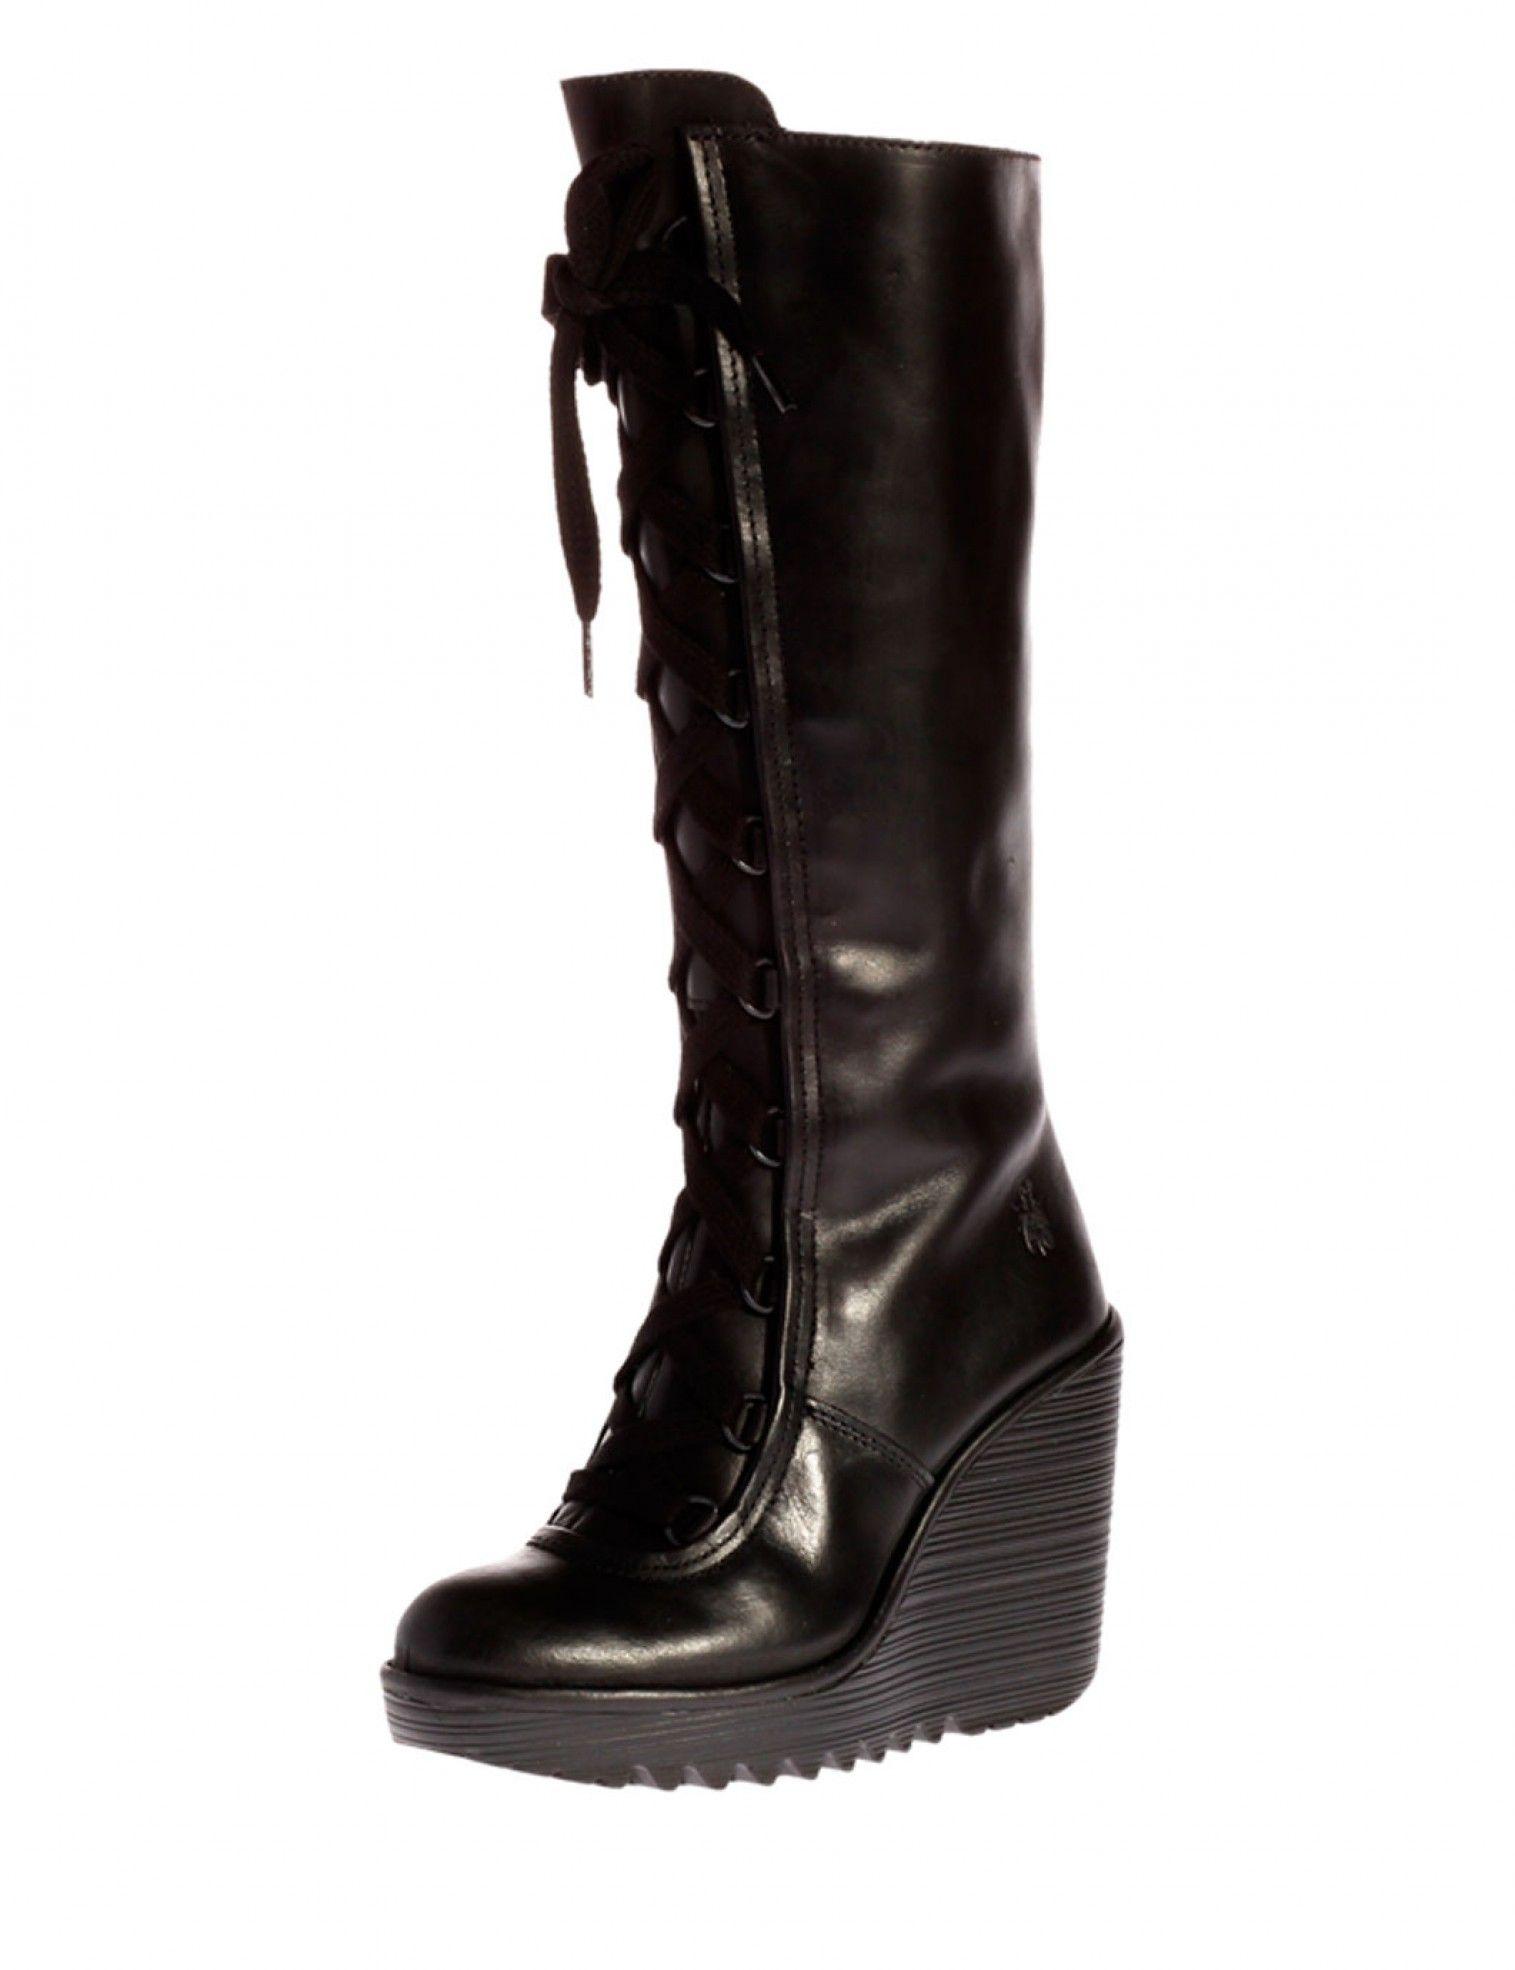 Lederart Glattes Rug Leder Farbe Schwarz Black Absatzhöhe 10cm Schuhe Leder Schwarz